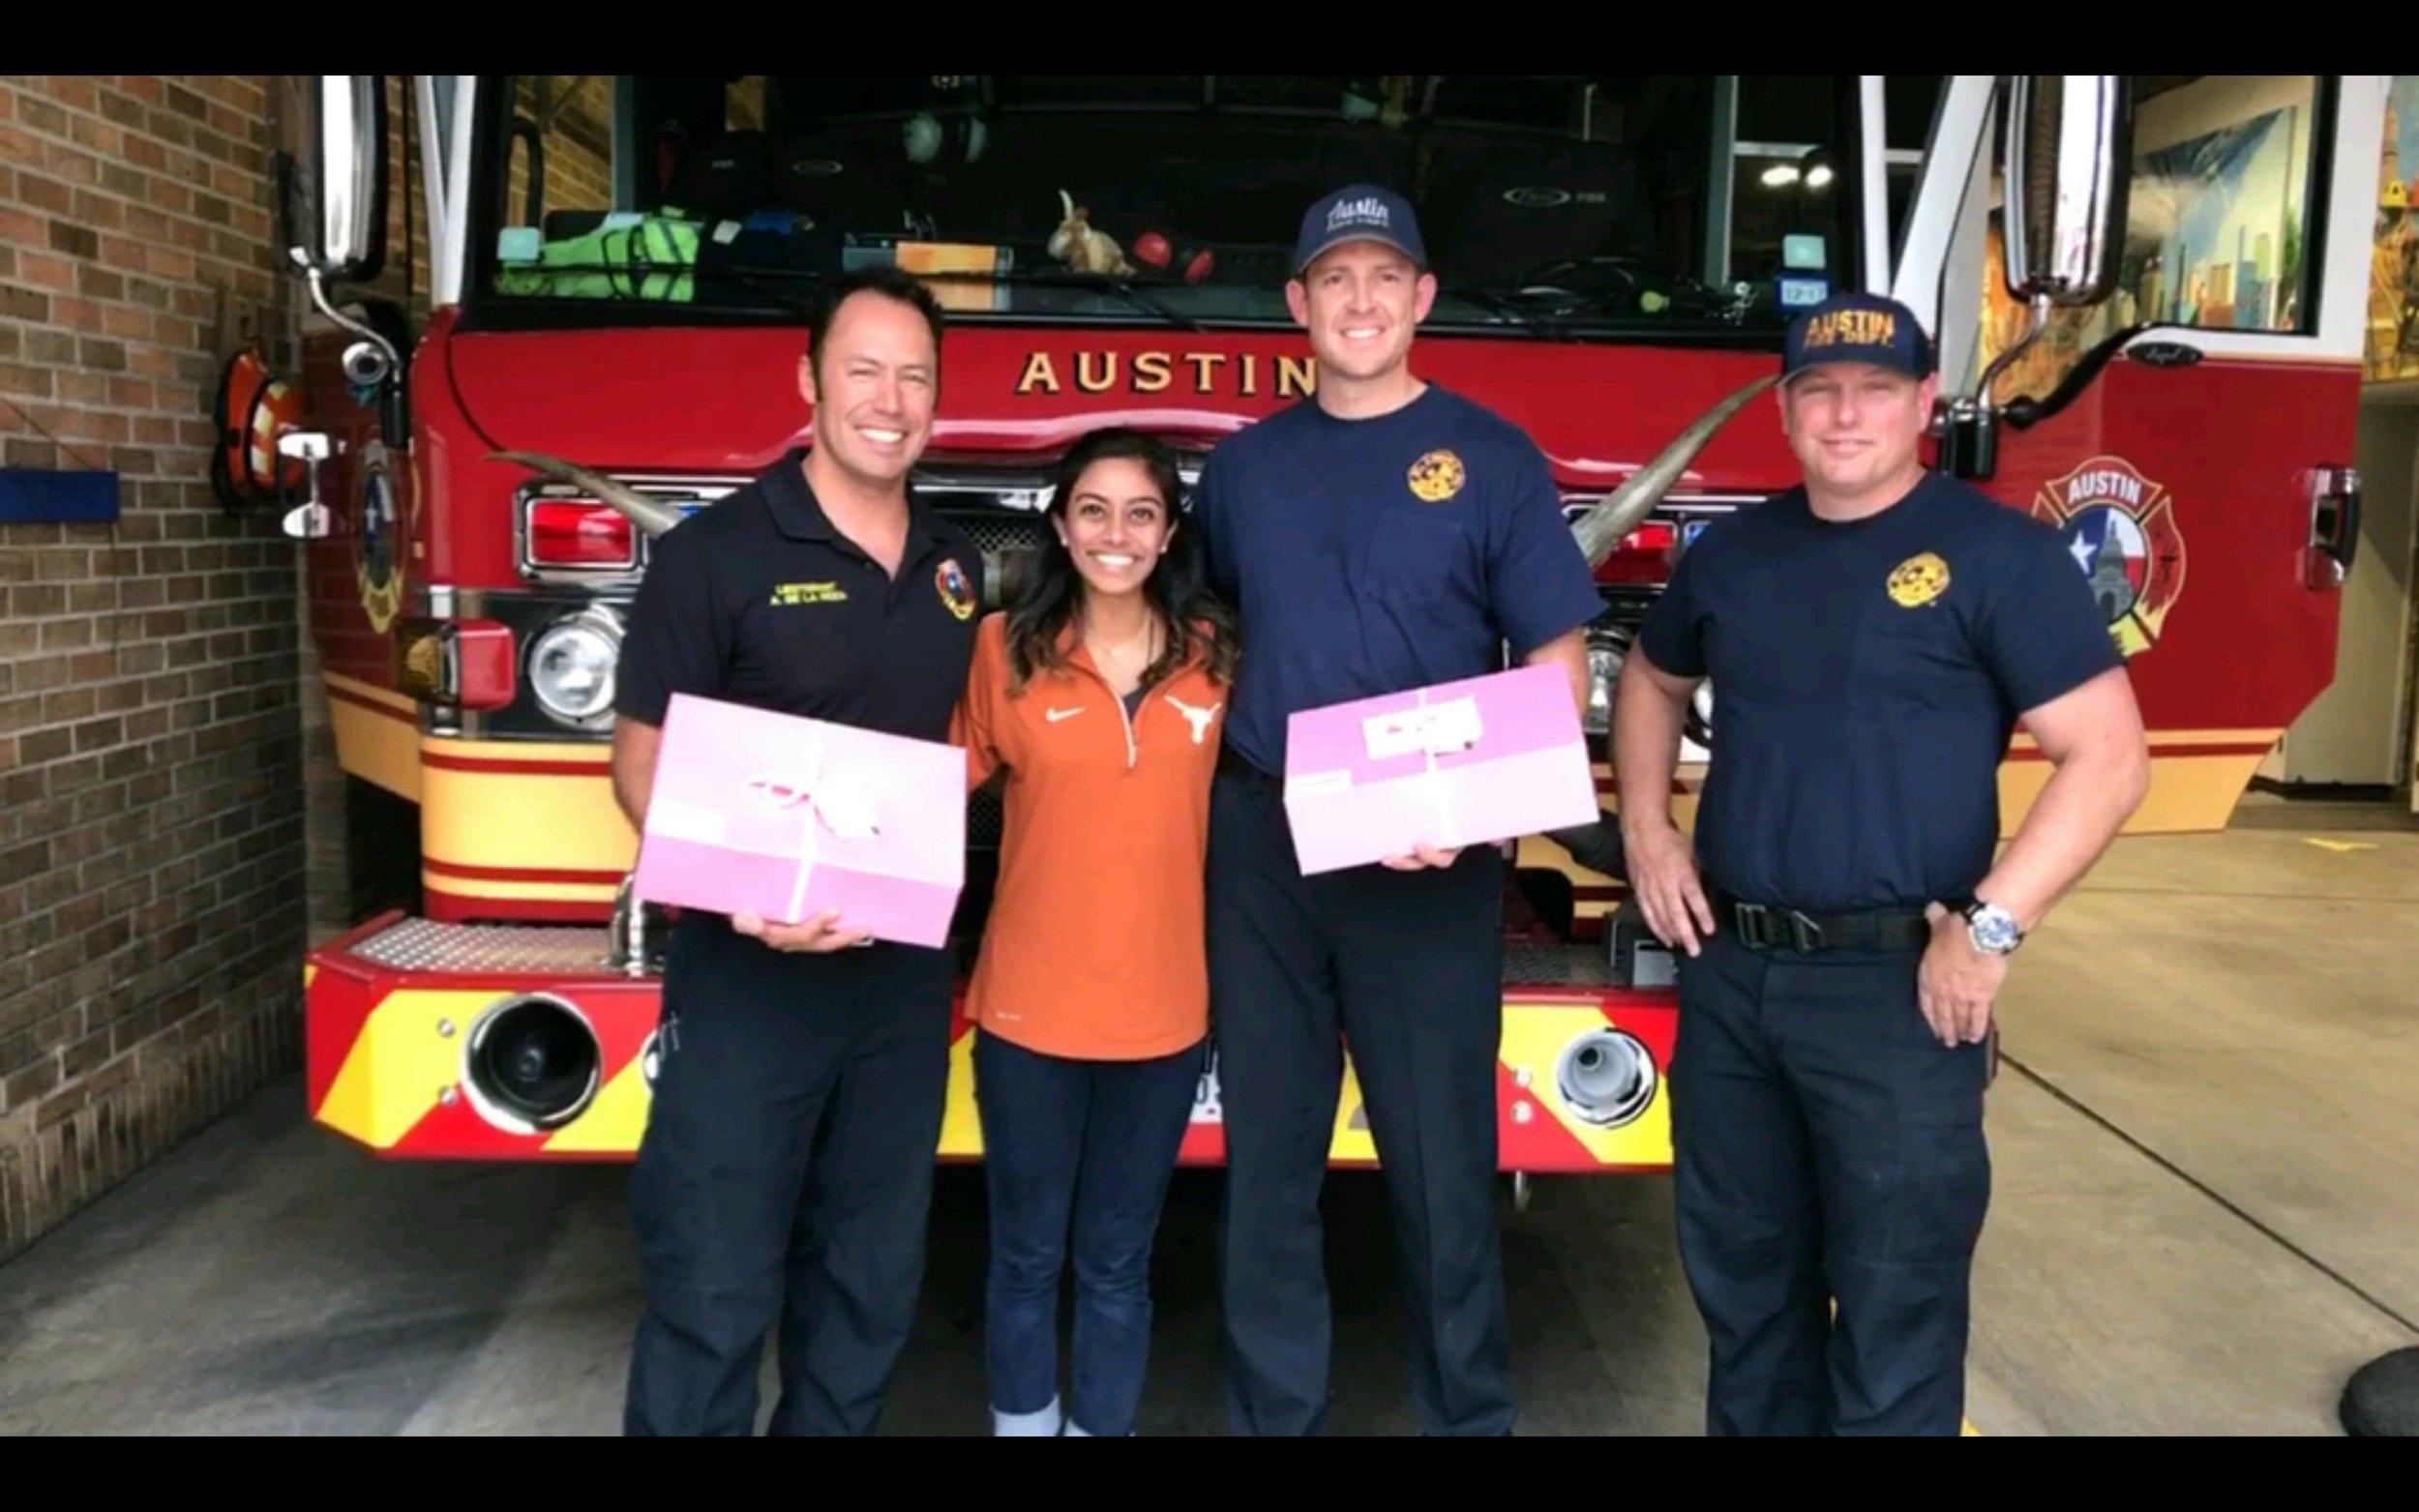 austincupcakes_community_cupcakes_firefighters_firstresponders1.jpg